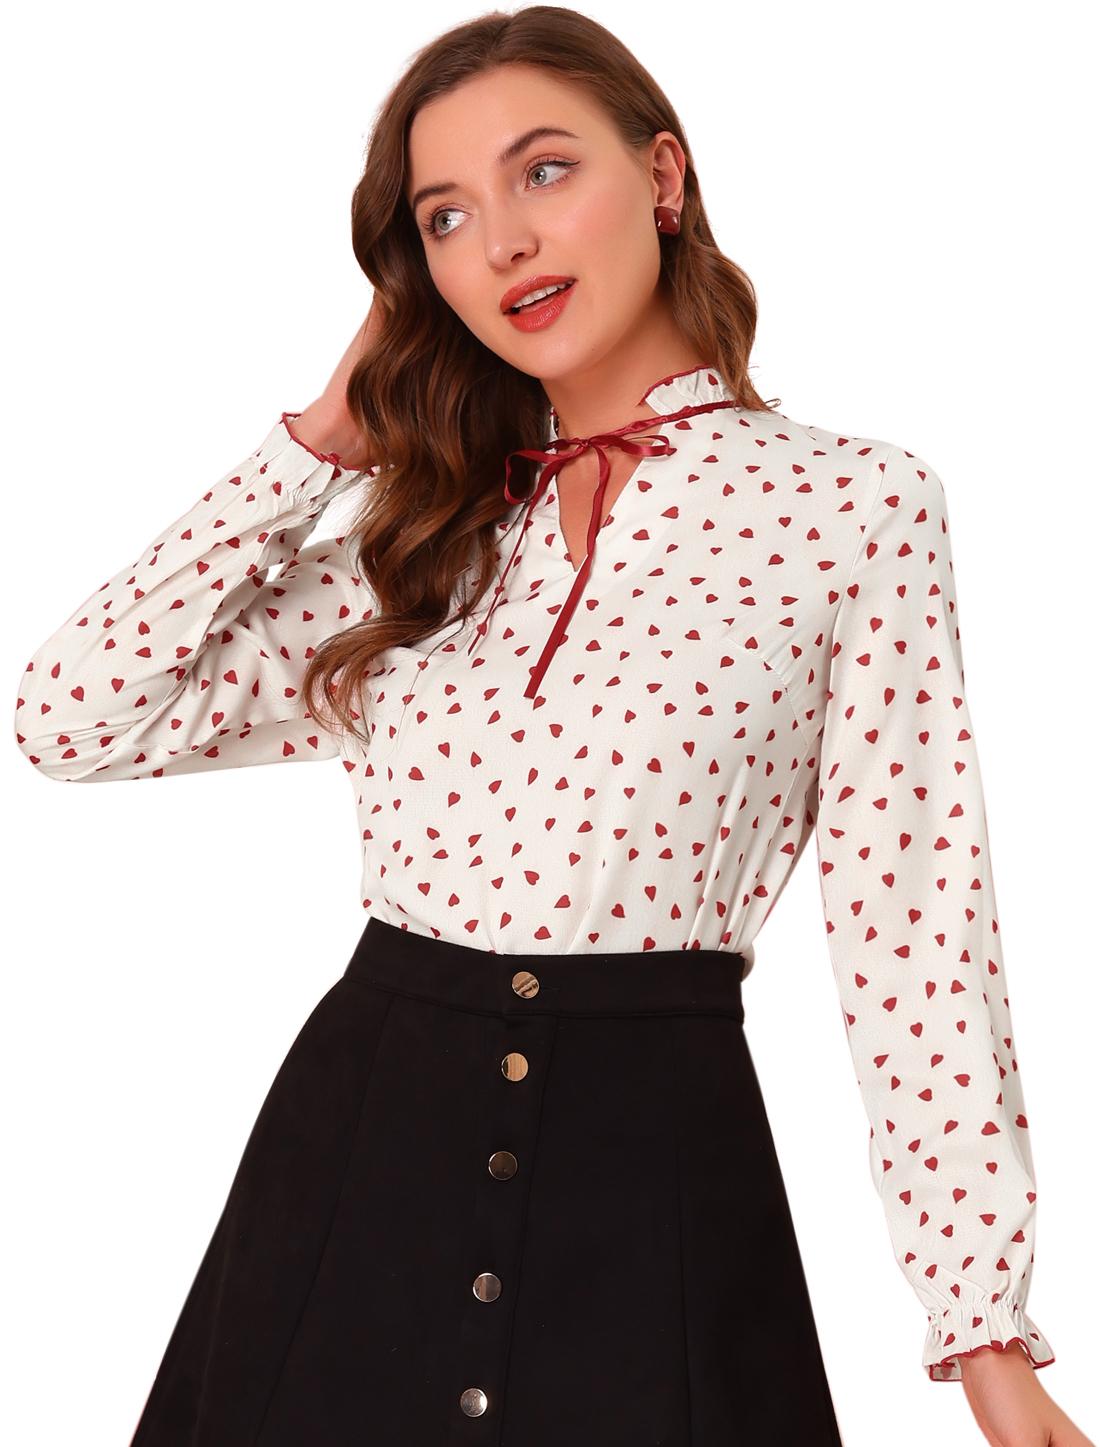 Allegra K Women's Tie Ruffled Neck Polka Dots Blouse Tops Beige Red XL